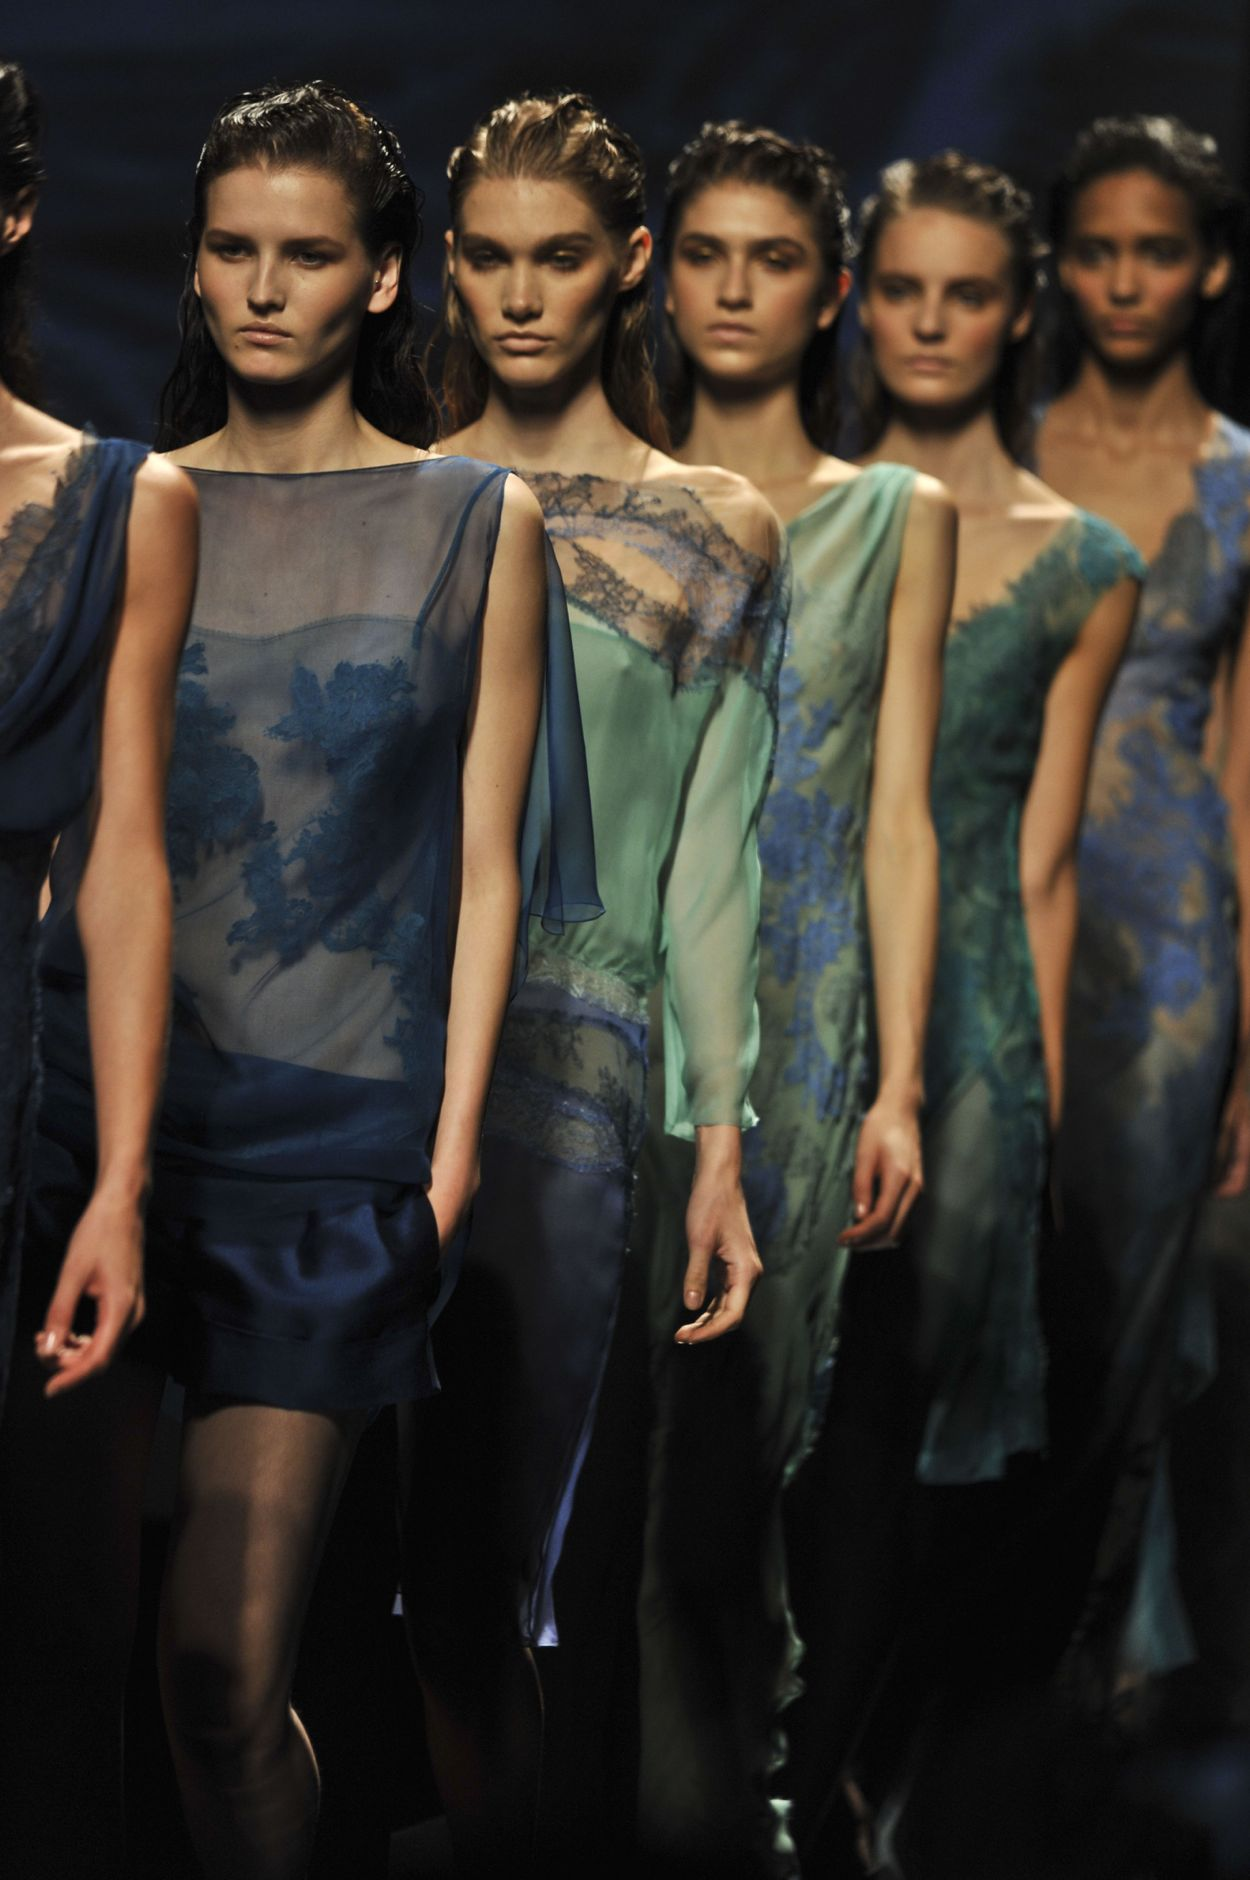 Alberta Ferretti Spring Summer 2013 Women Collection Milano Fashion Week Runway Finale